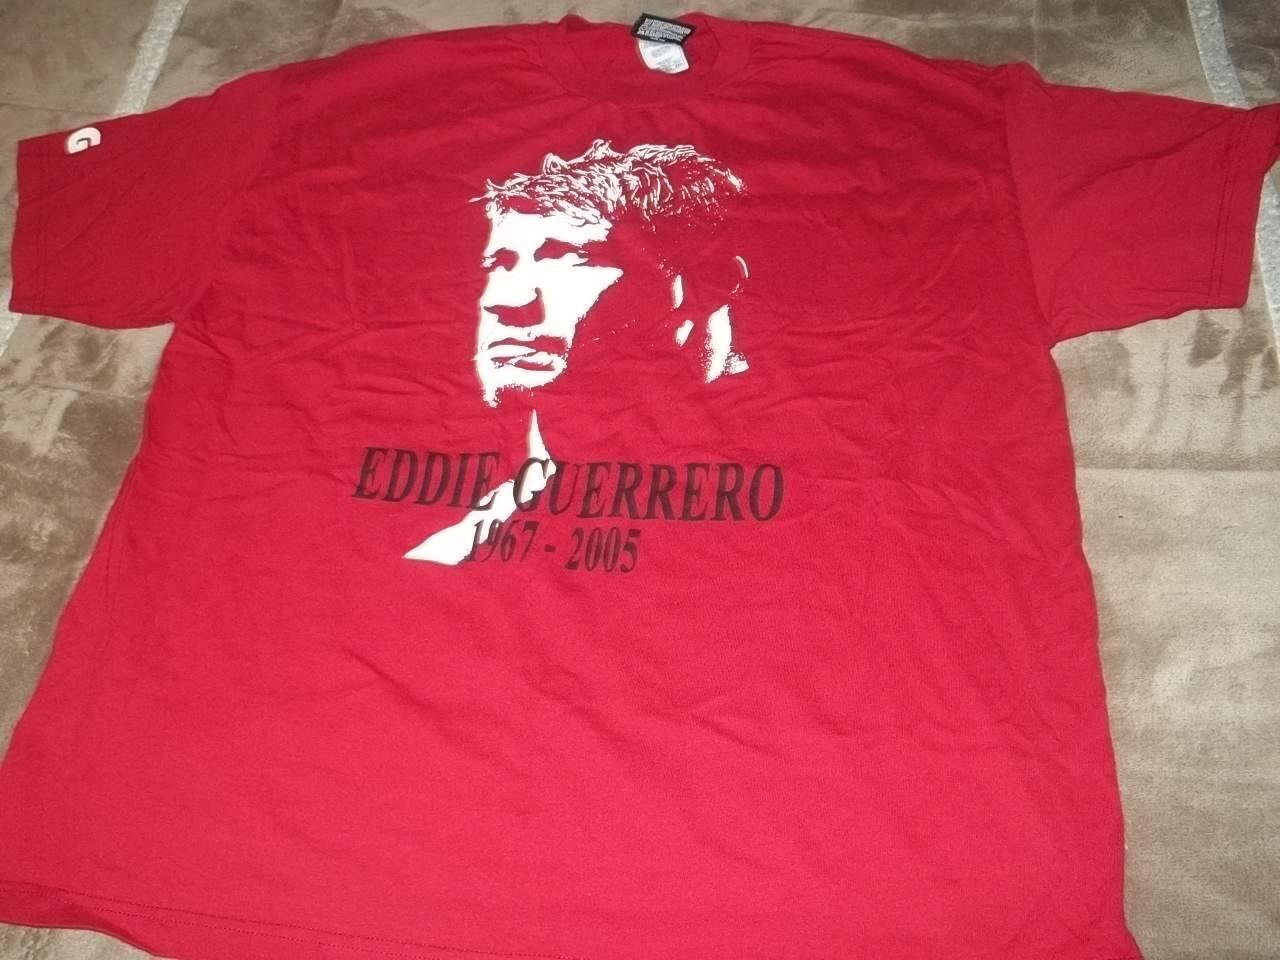 Eddie Guerrero T Shirt WWE RIP 1967-2005  Size 2XL